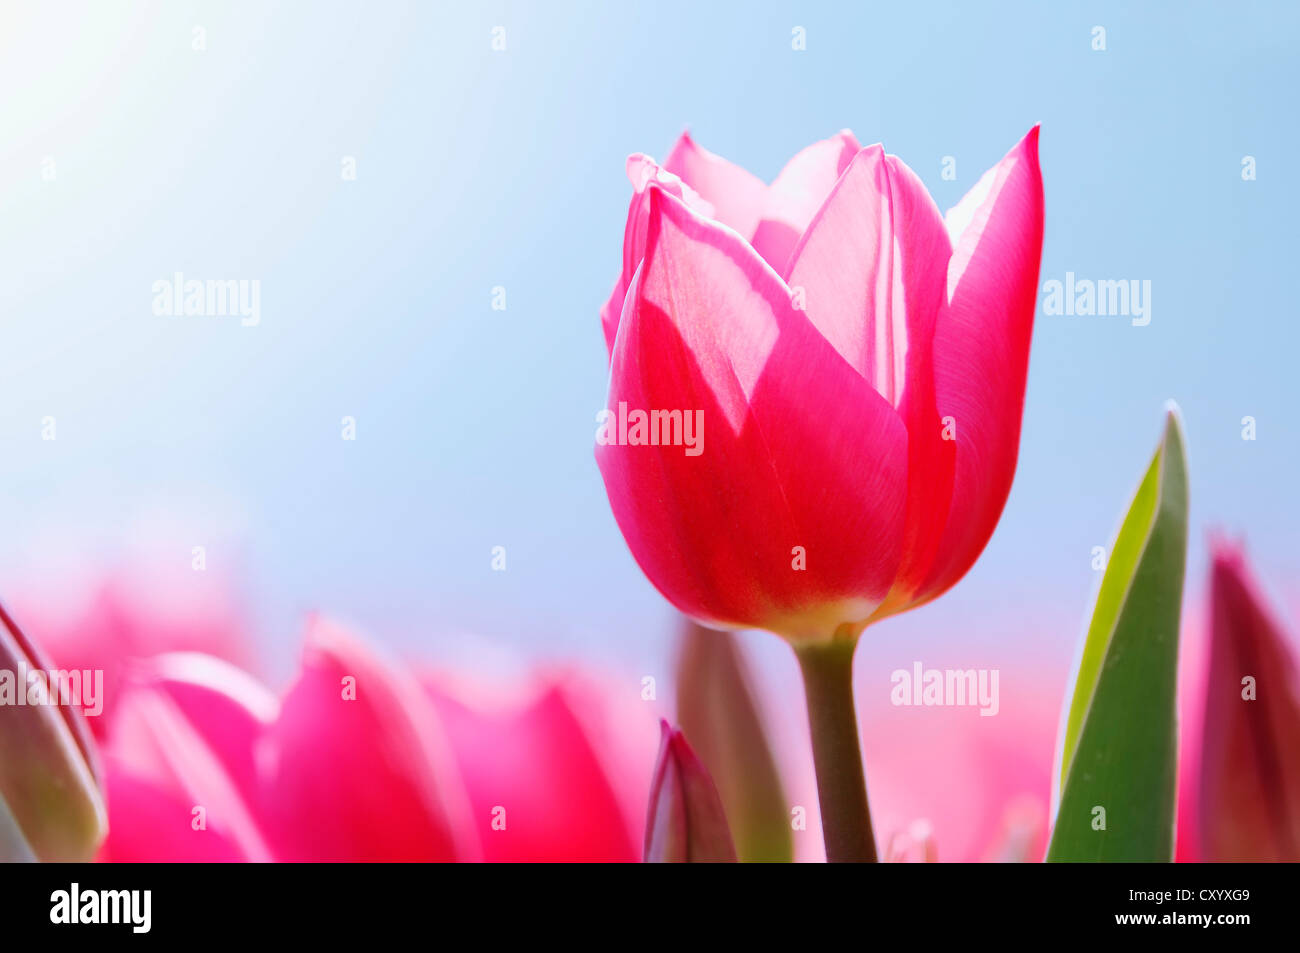 Tulip (Tulipa sp.), Netherlands, Europe - Stock Image